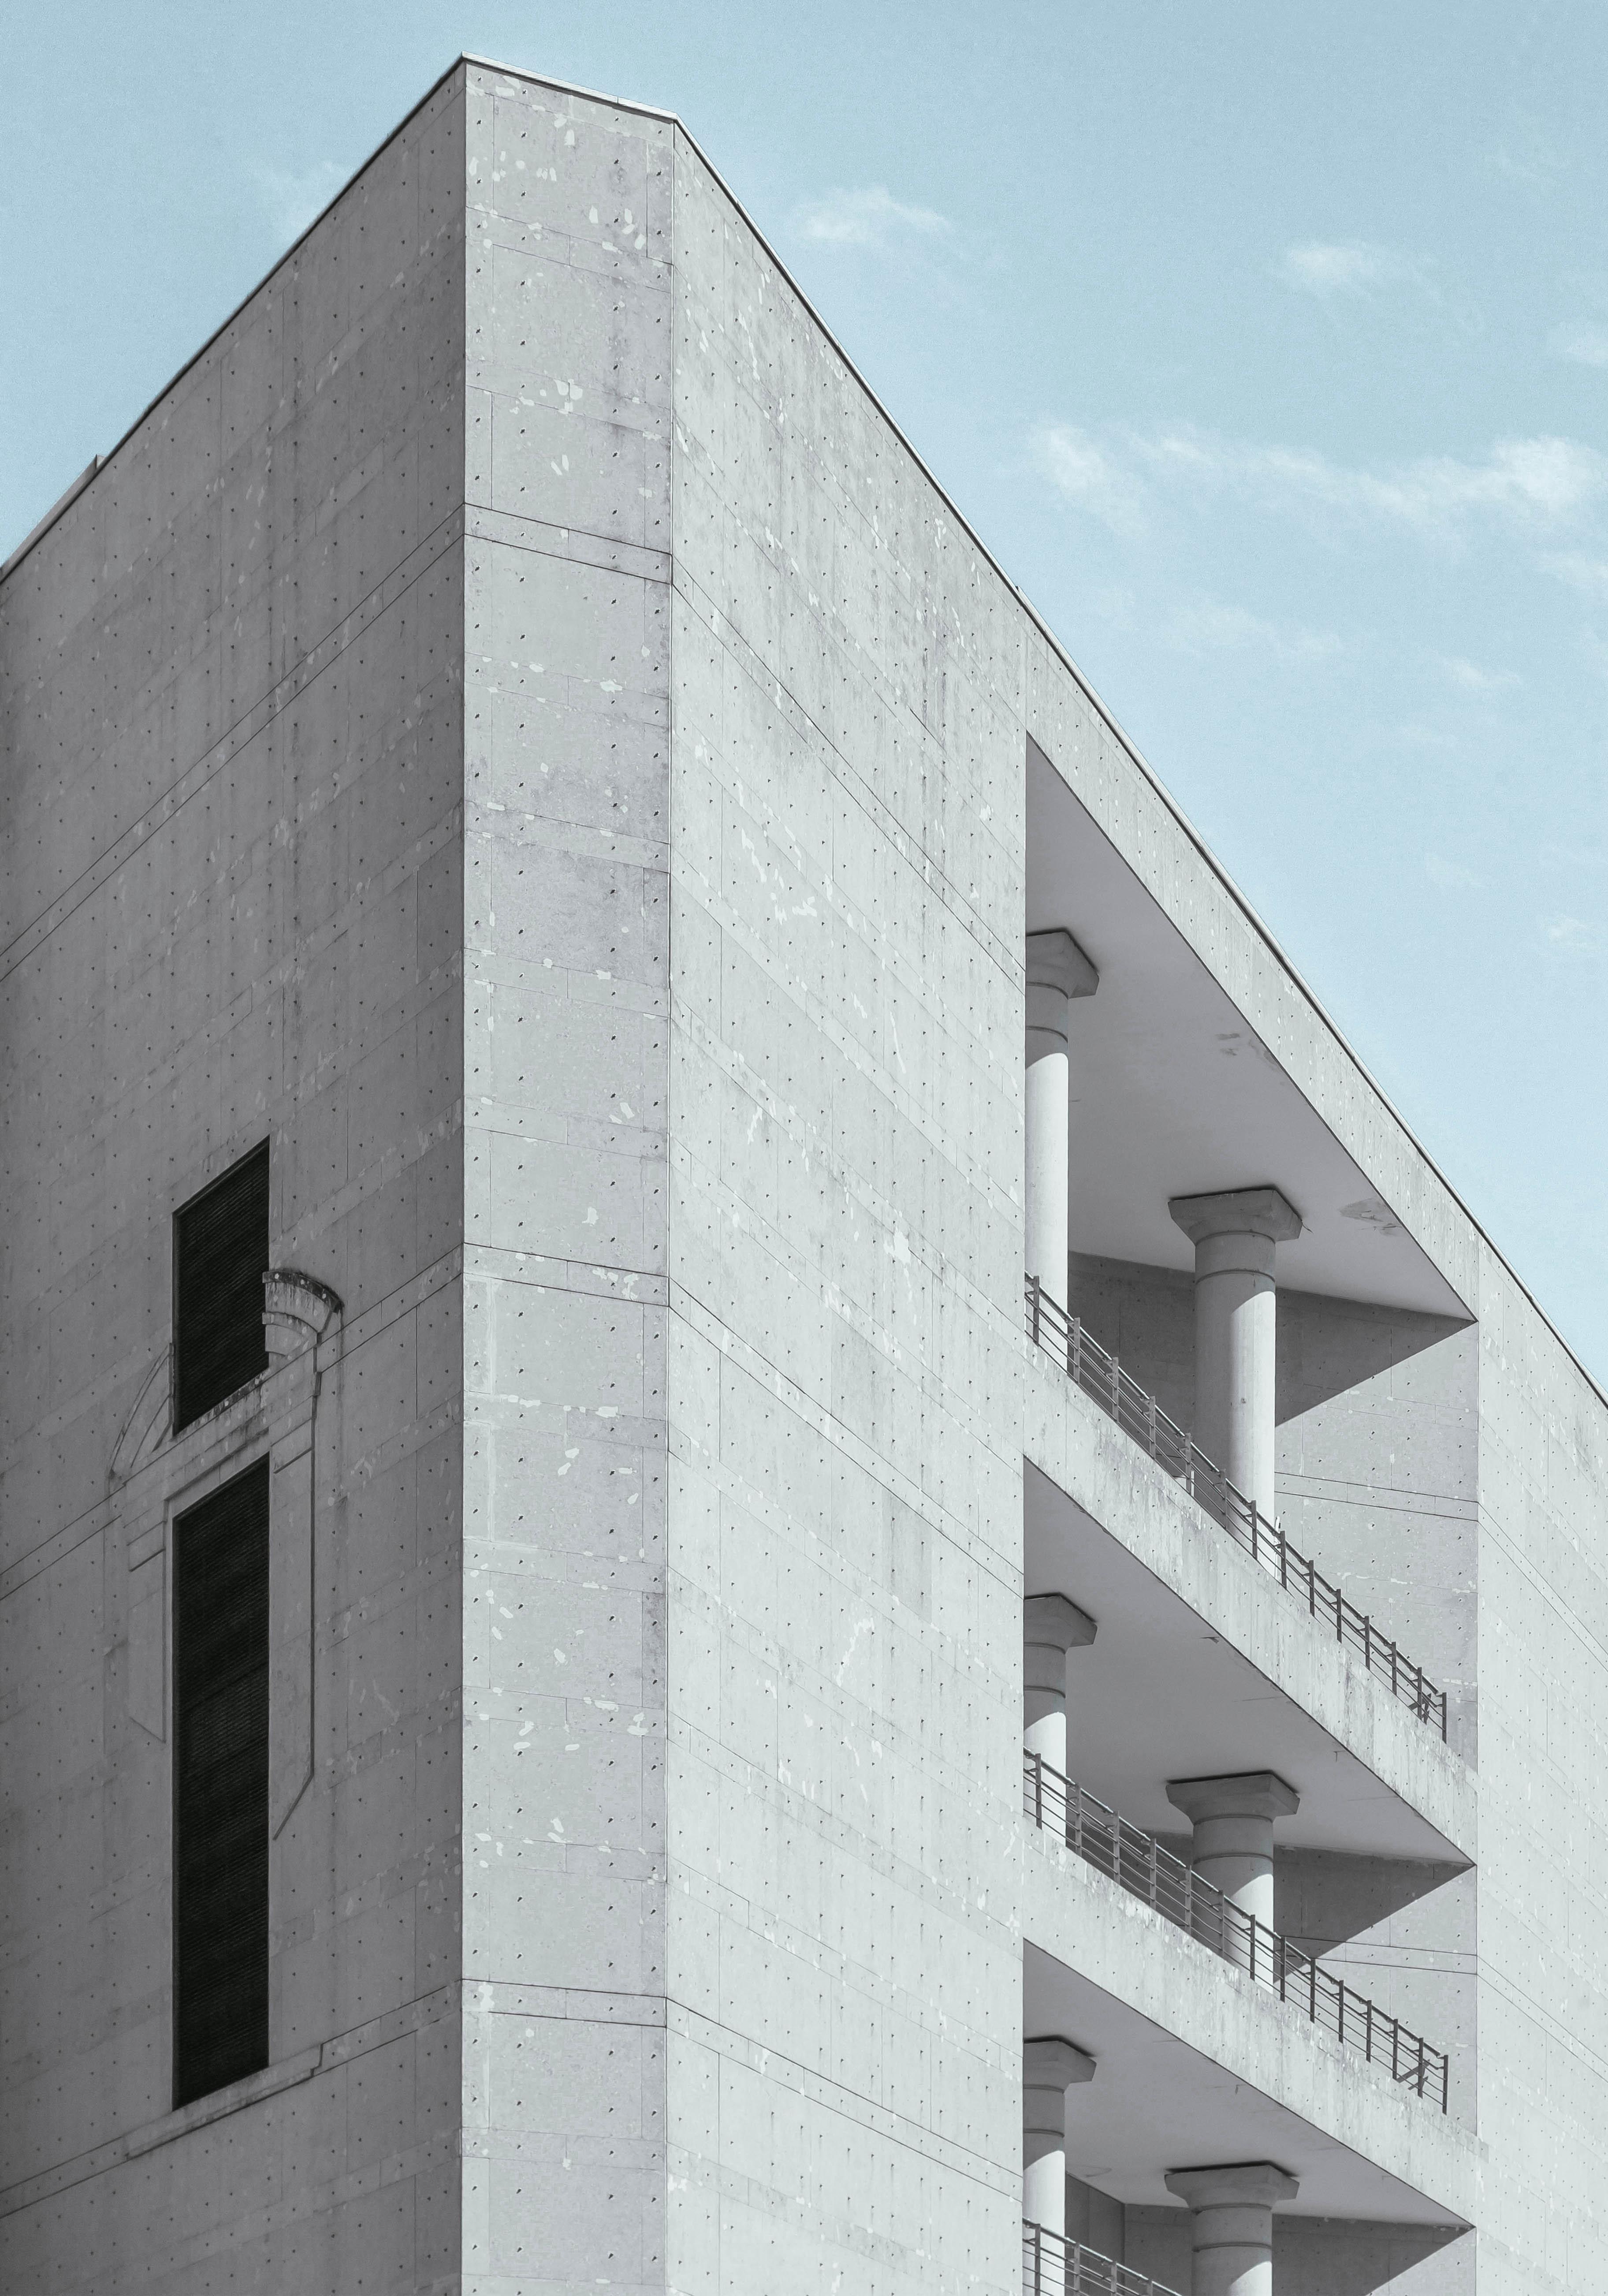 Steel Structural Buildings Design